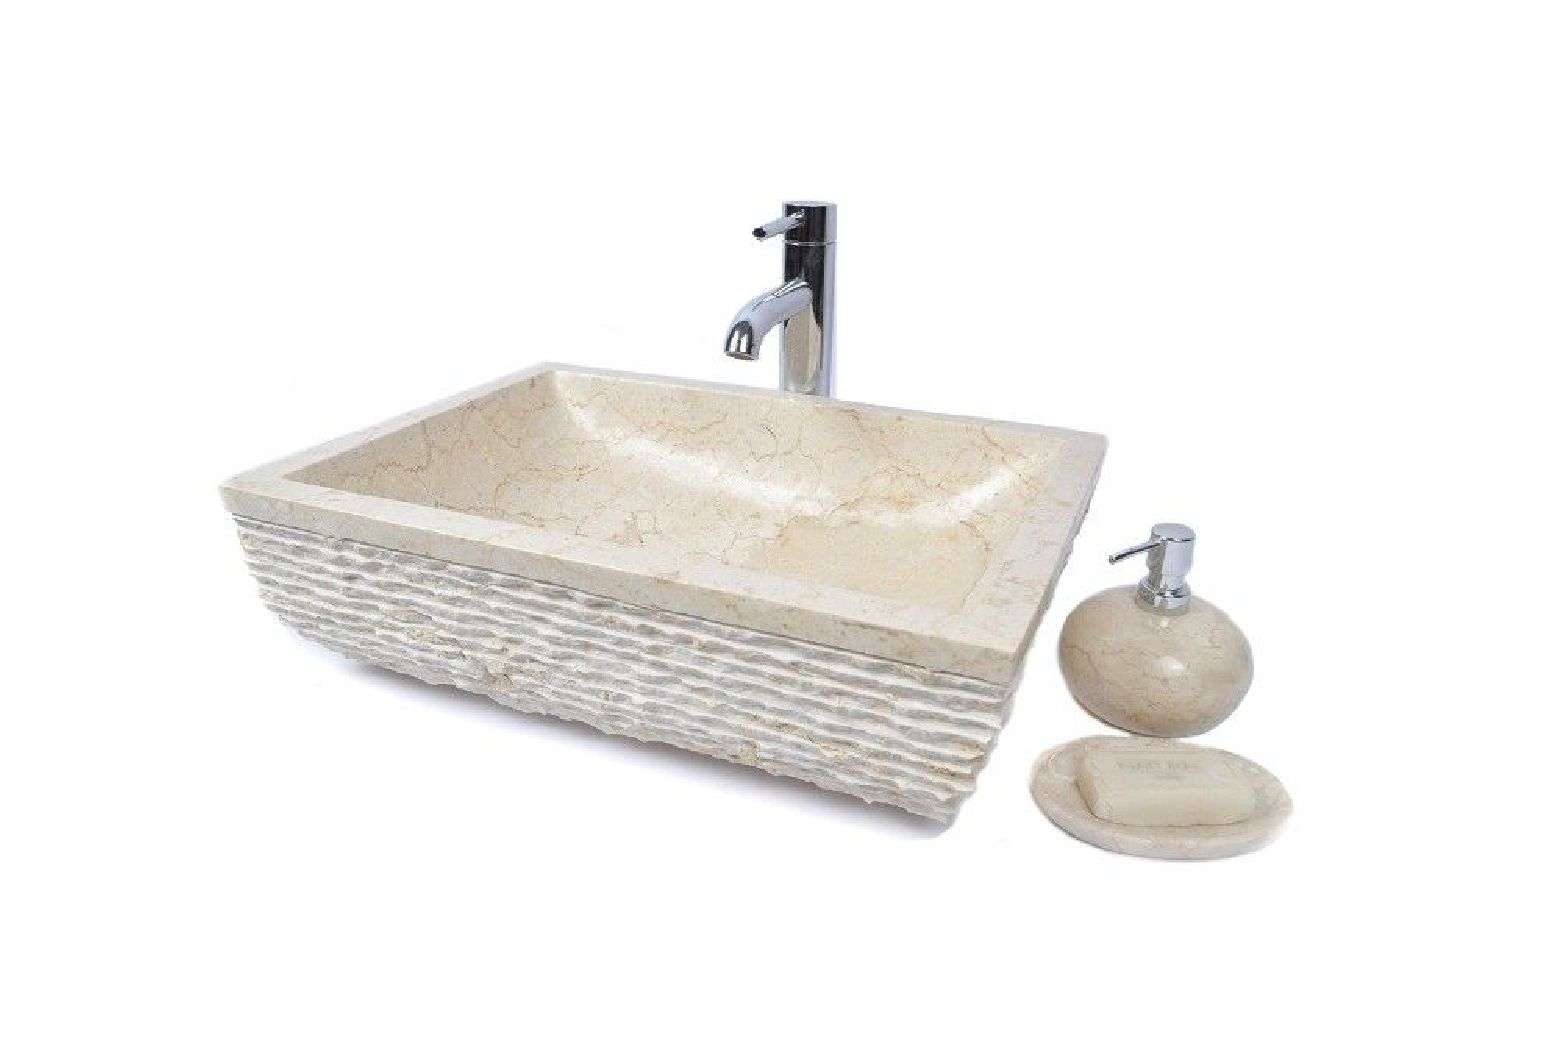 Rcu-m cream b 50x35 cm wash basin overtop